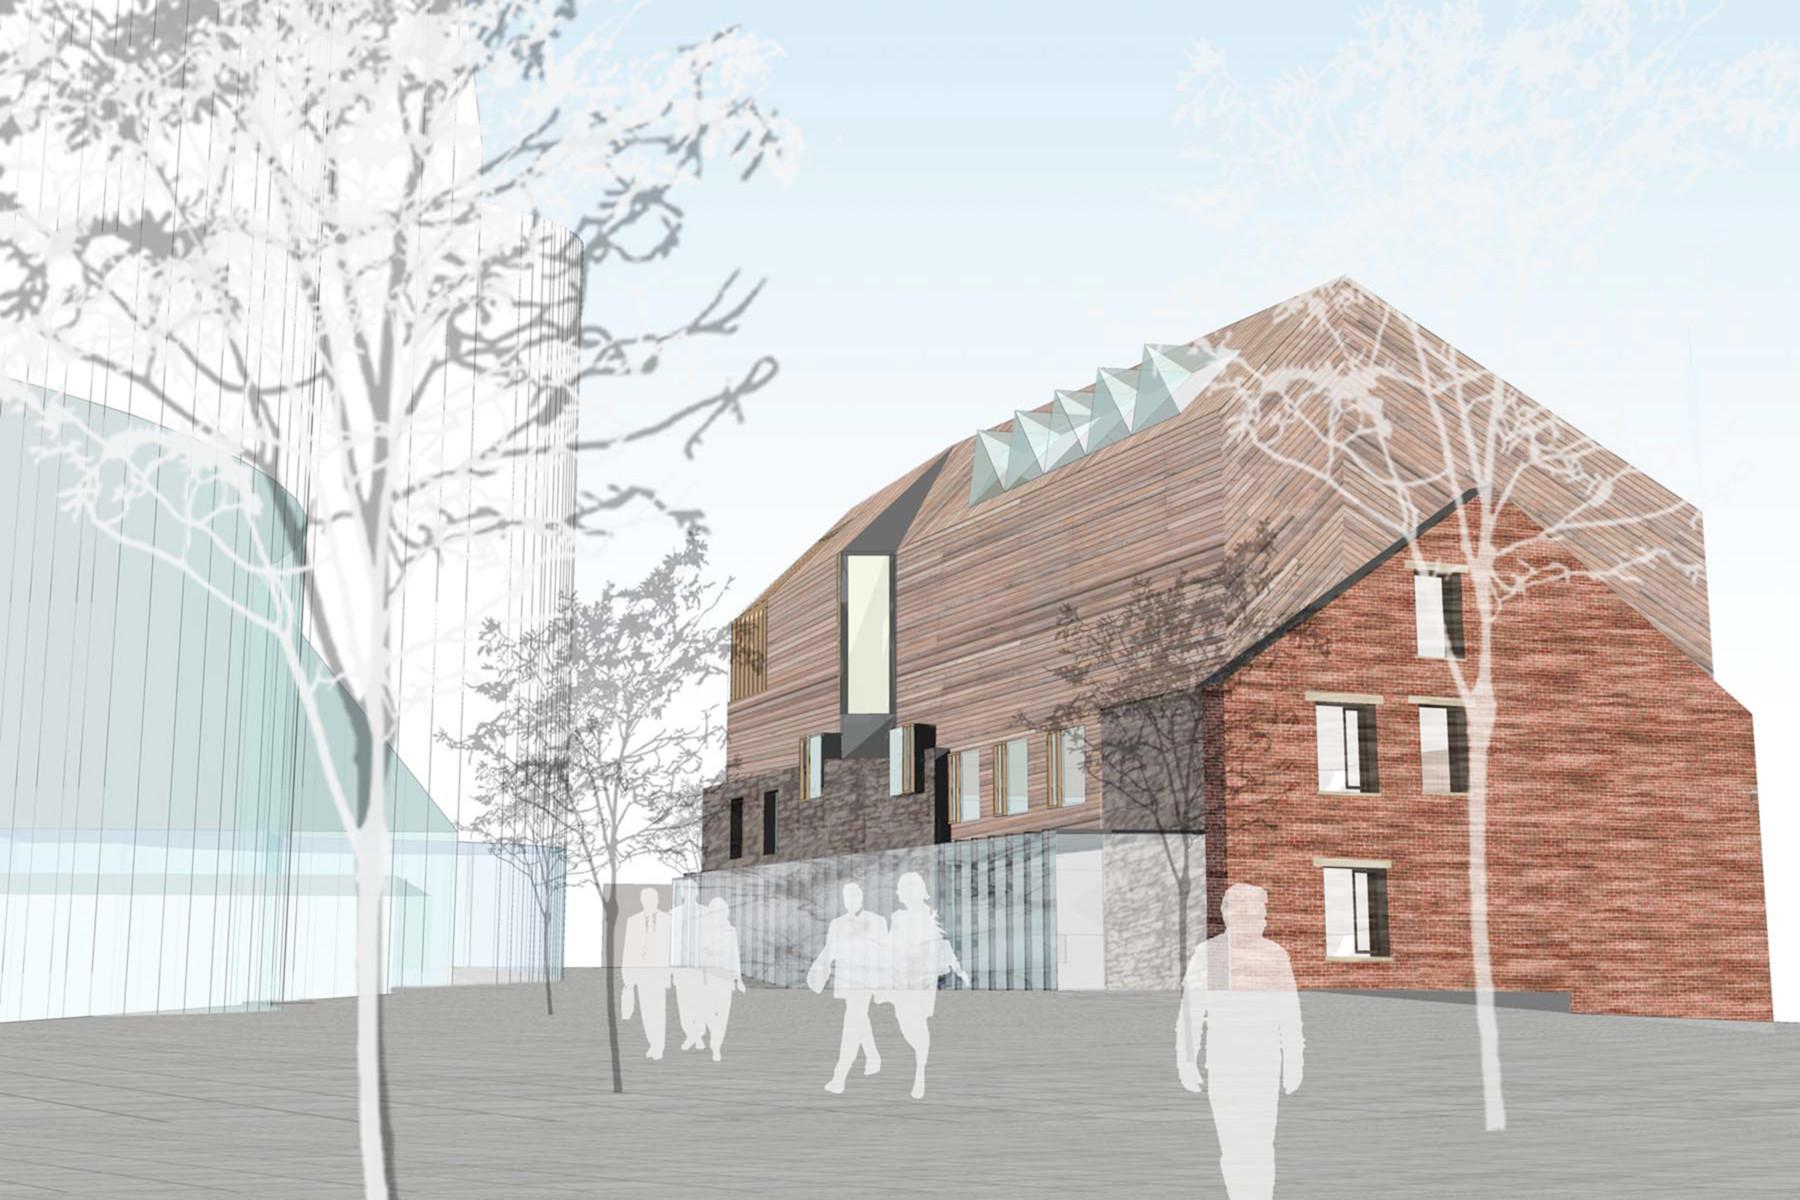 Sarah-Wigglesworth-Architects Swansea-Print-Works East View 3600